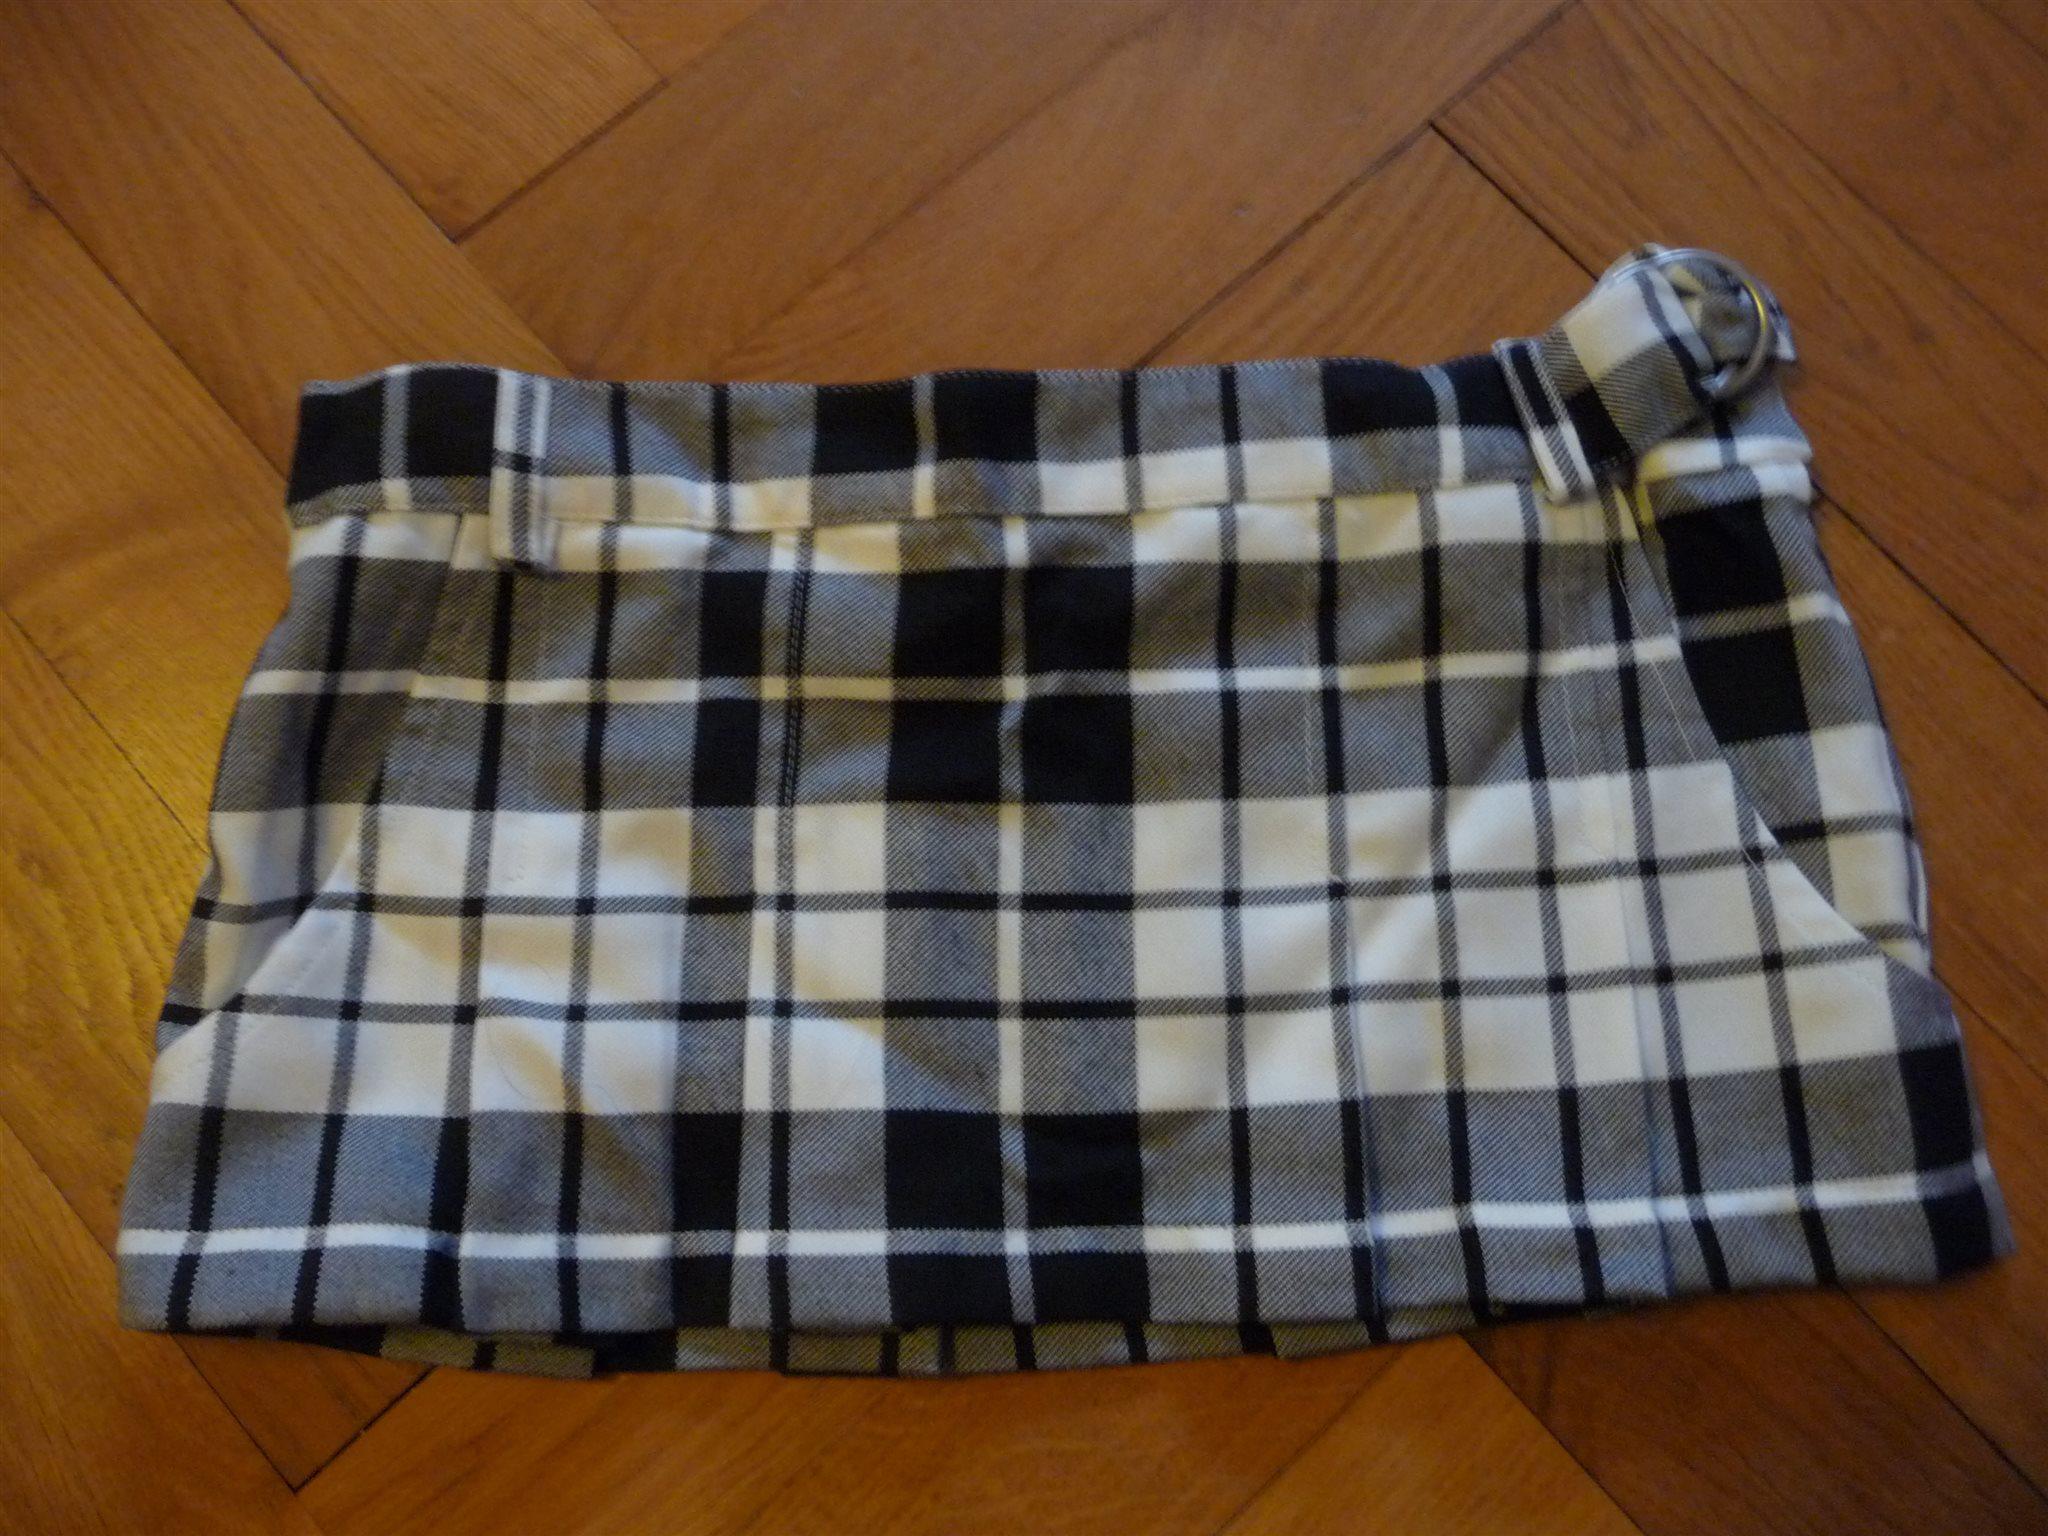 017c7c551828 Mini minikjol kjol Junior Gaultier original rut.. (333193664) ᐈ Köp ...